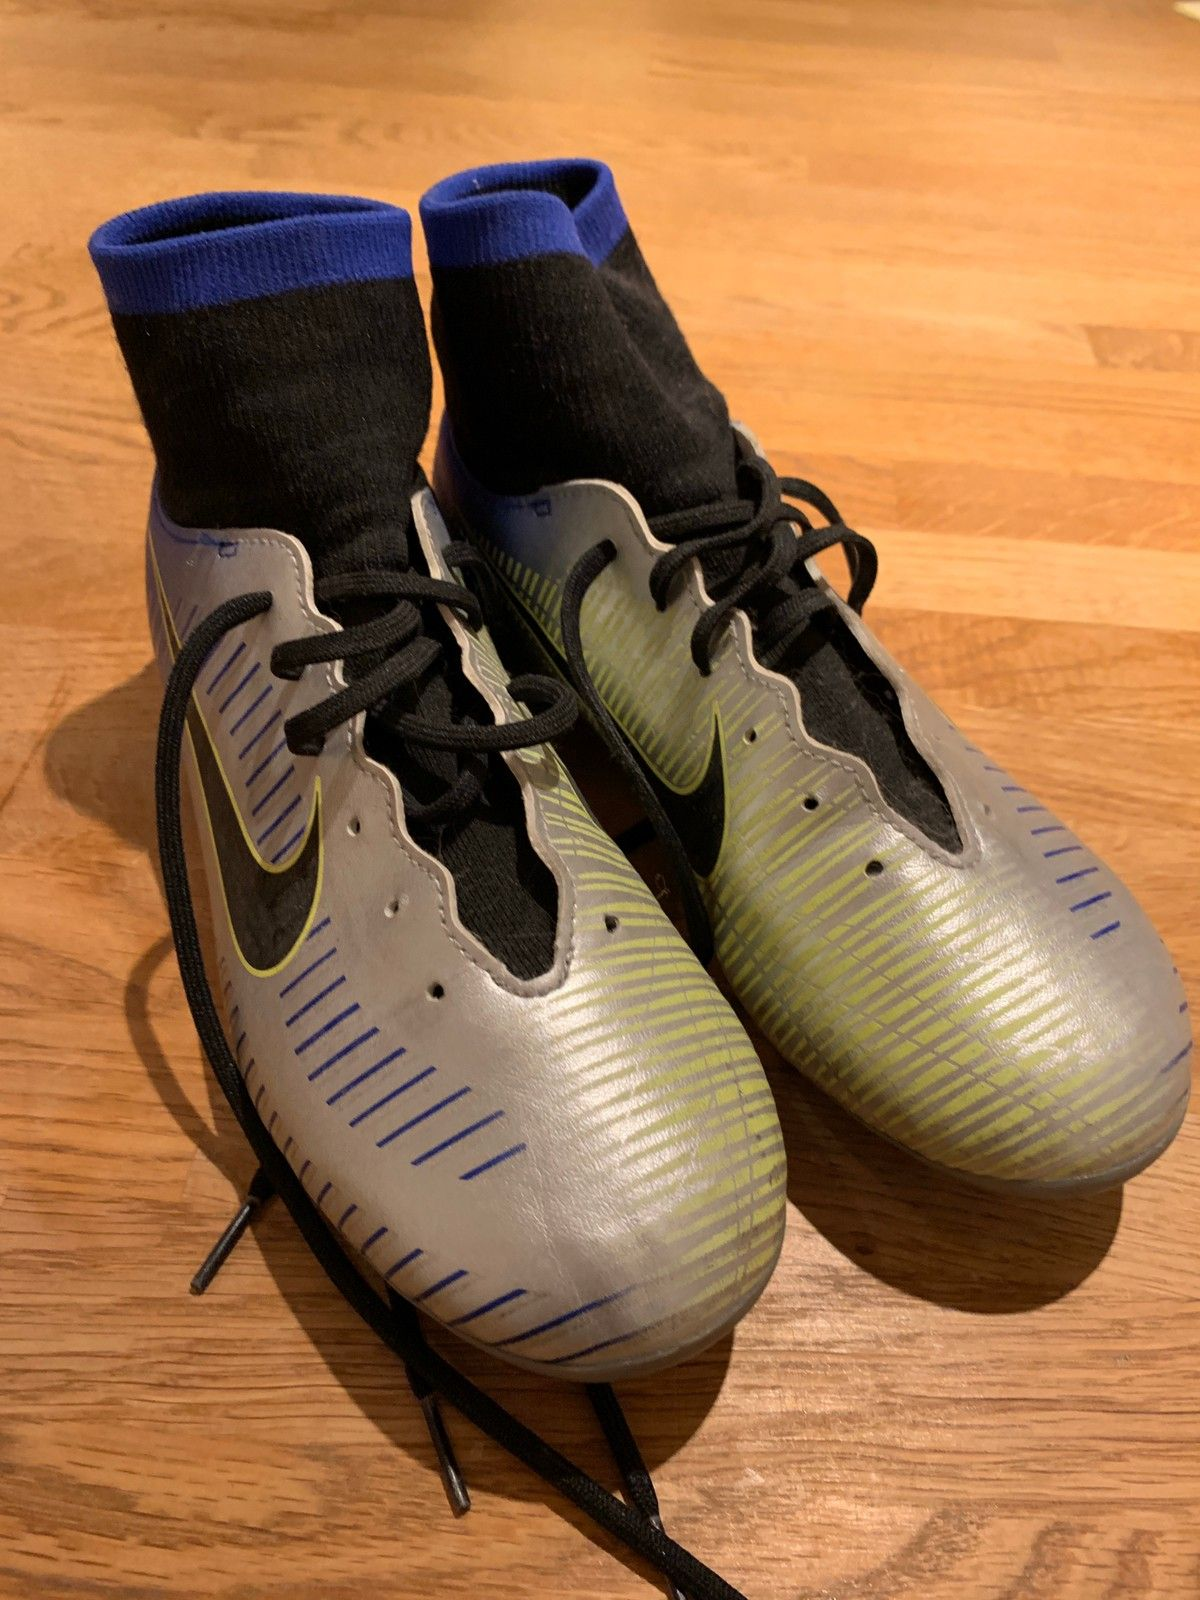 Nike mercurial kunstgress sko str. 38.5 | FINN.no